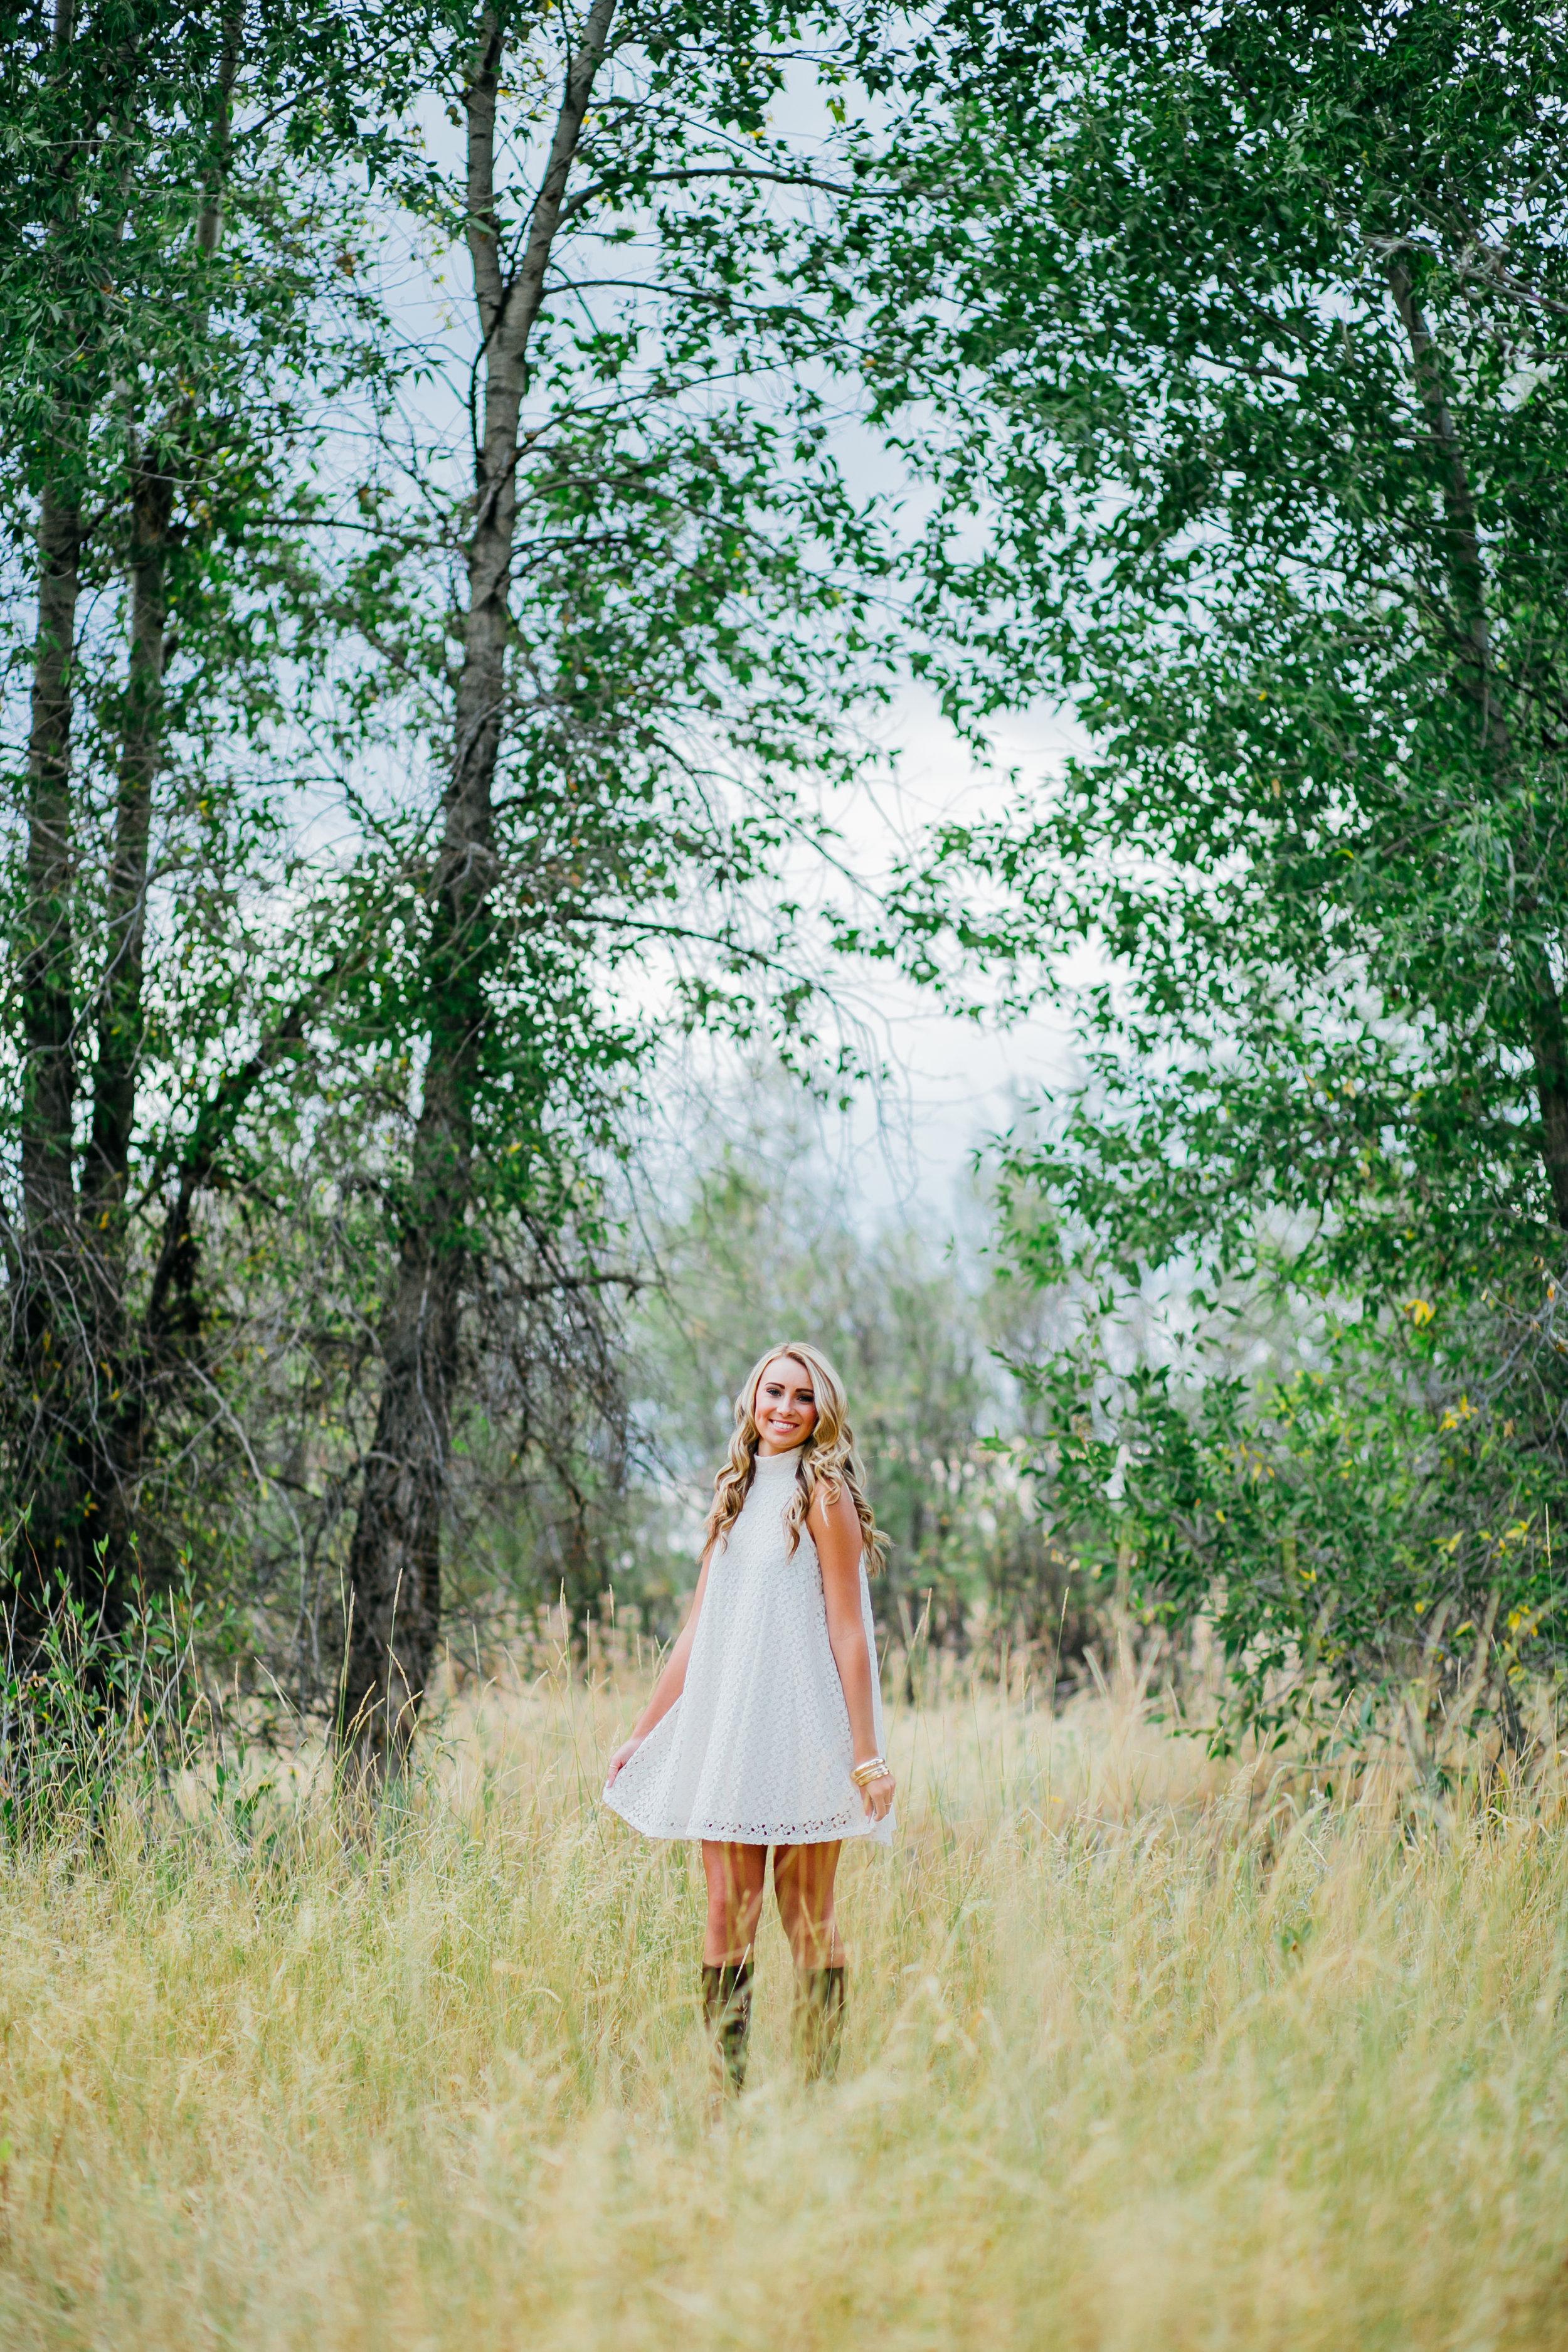 Savannah Sheppard 2016 (49 of 123).jpg